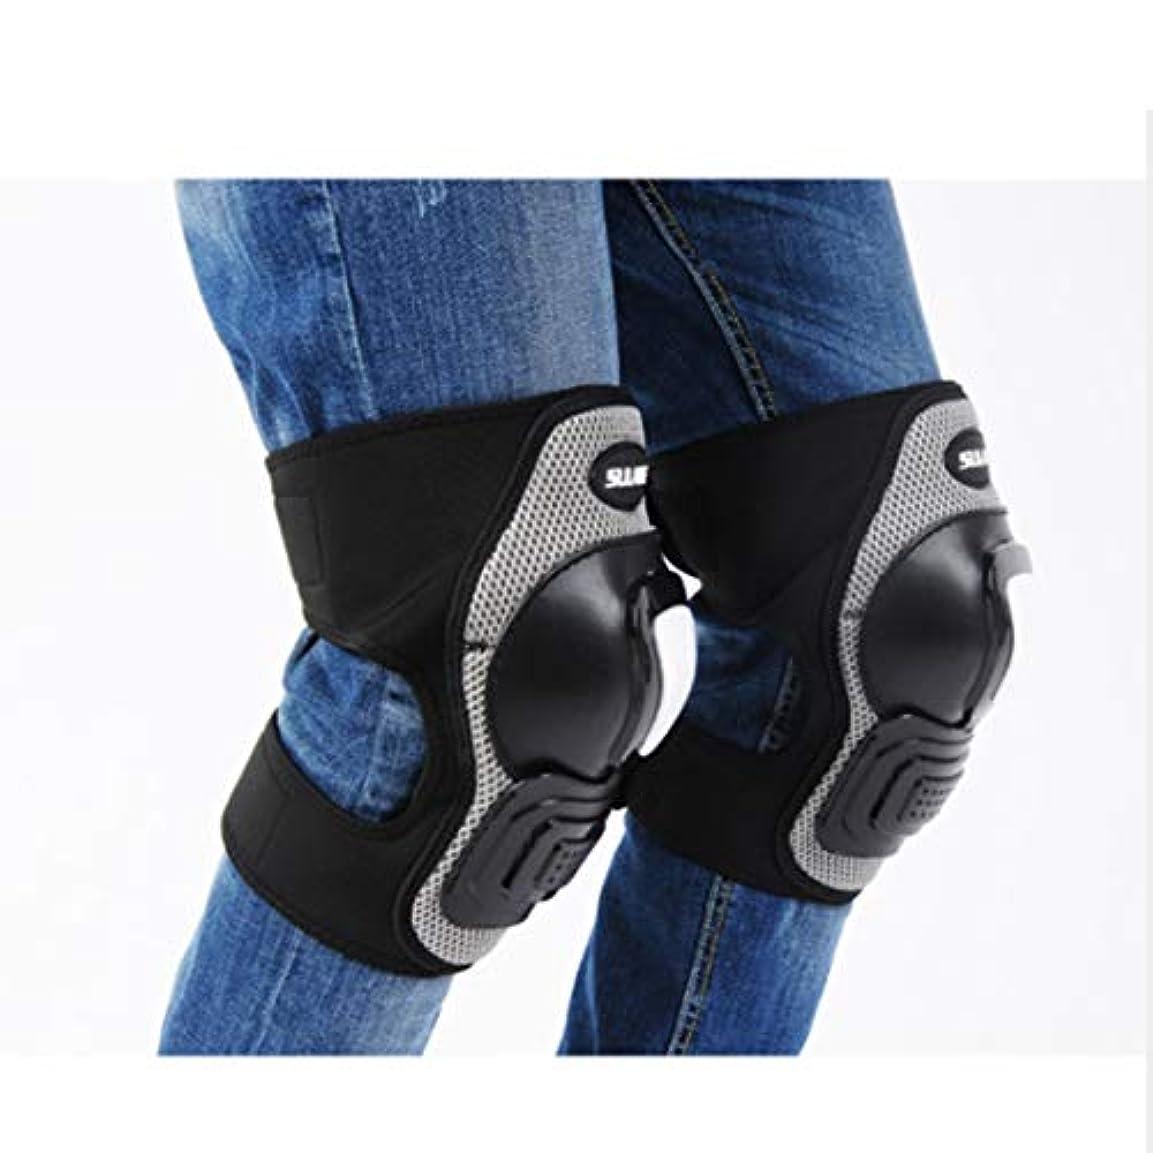 FELICIAAA オートバイの膝パッド大人の通気性調節可能なアラミド繊維モトクロスMTB新ガードサイクリングスケーティングスキー (色